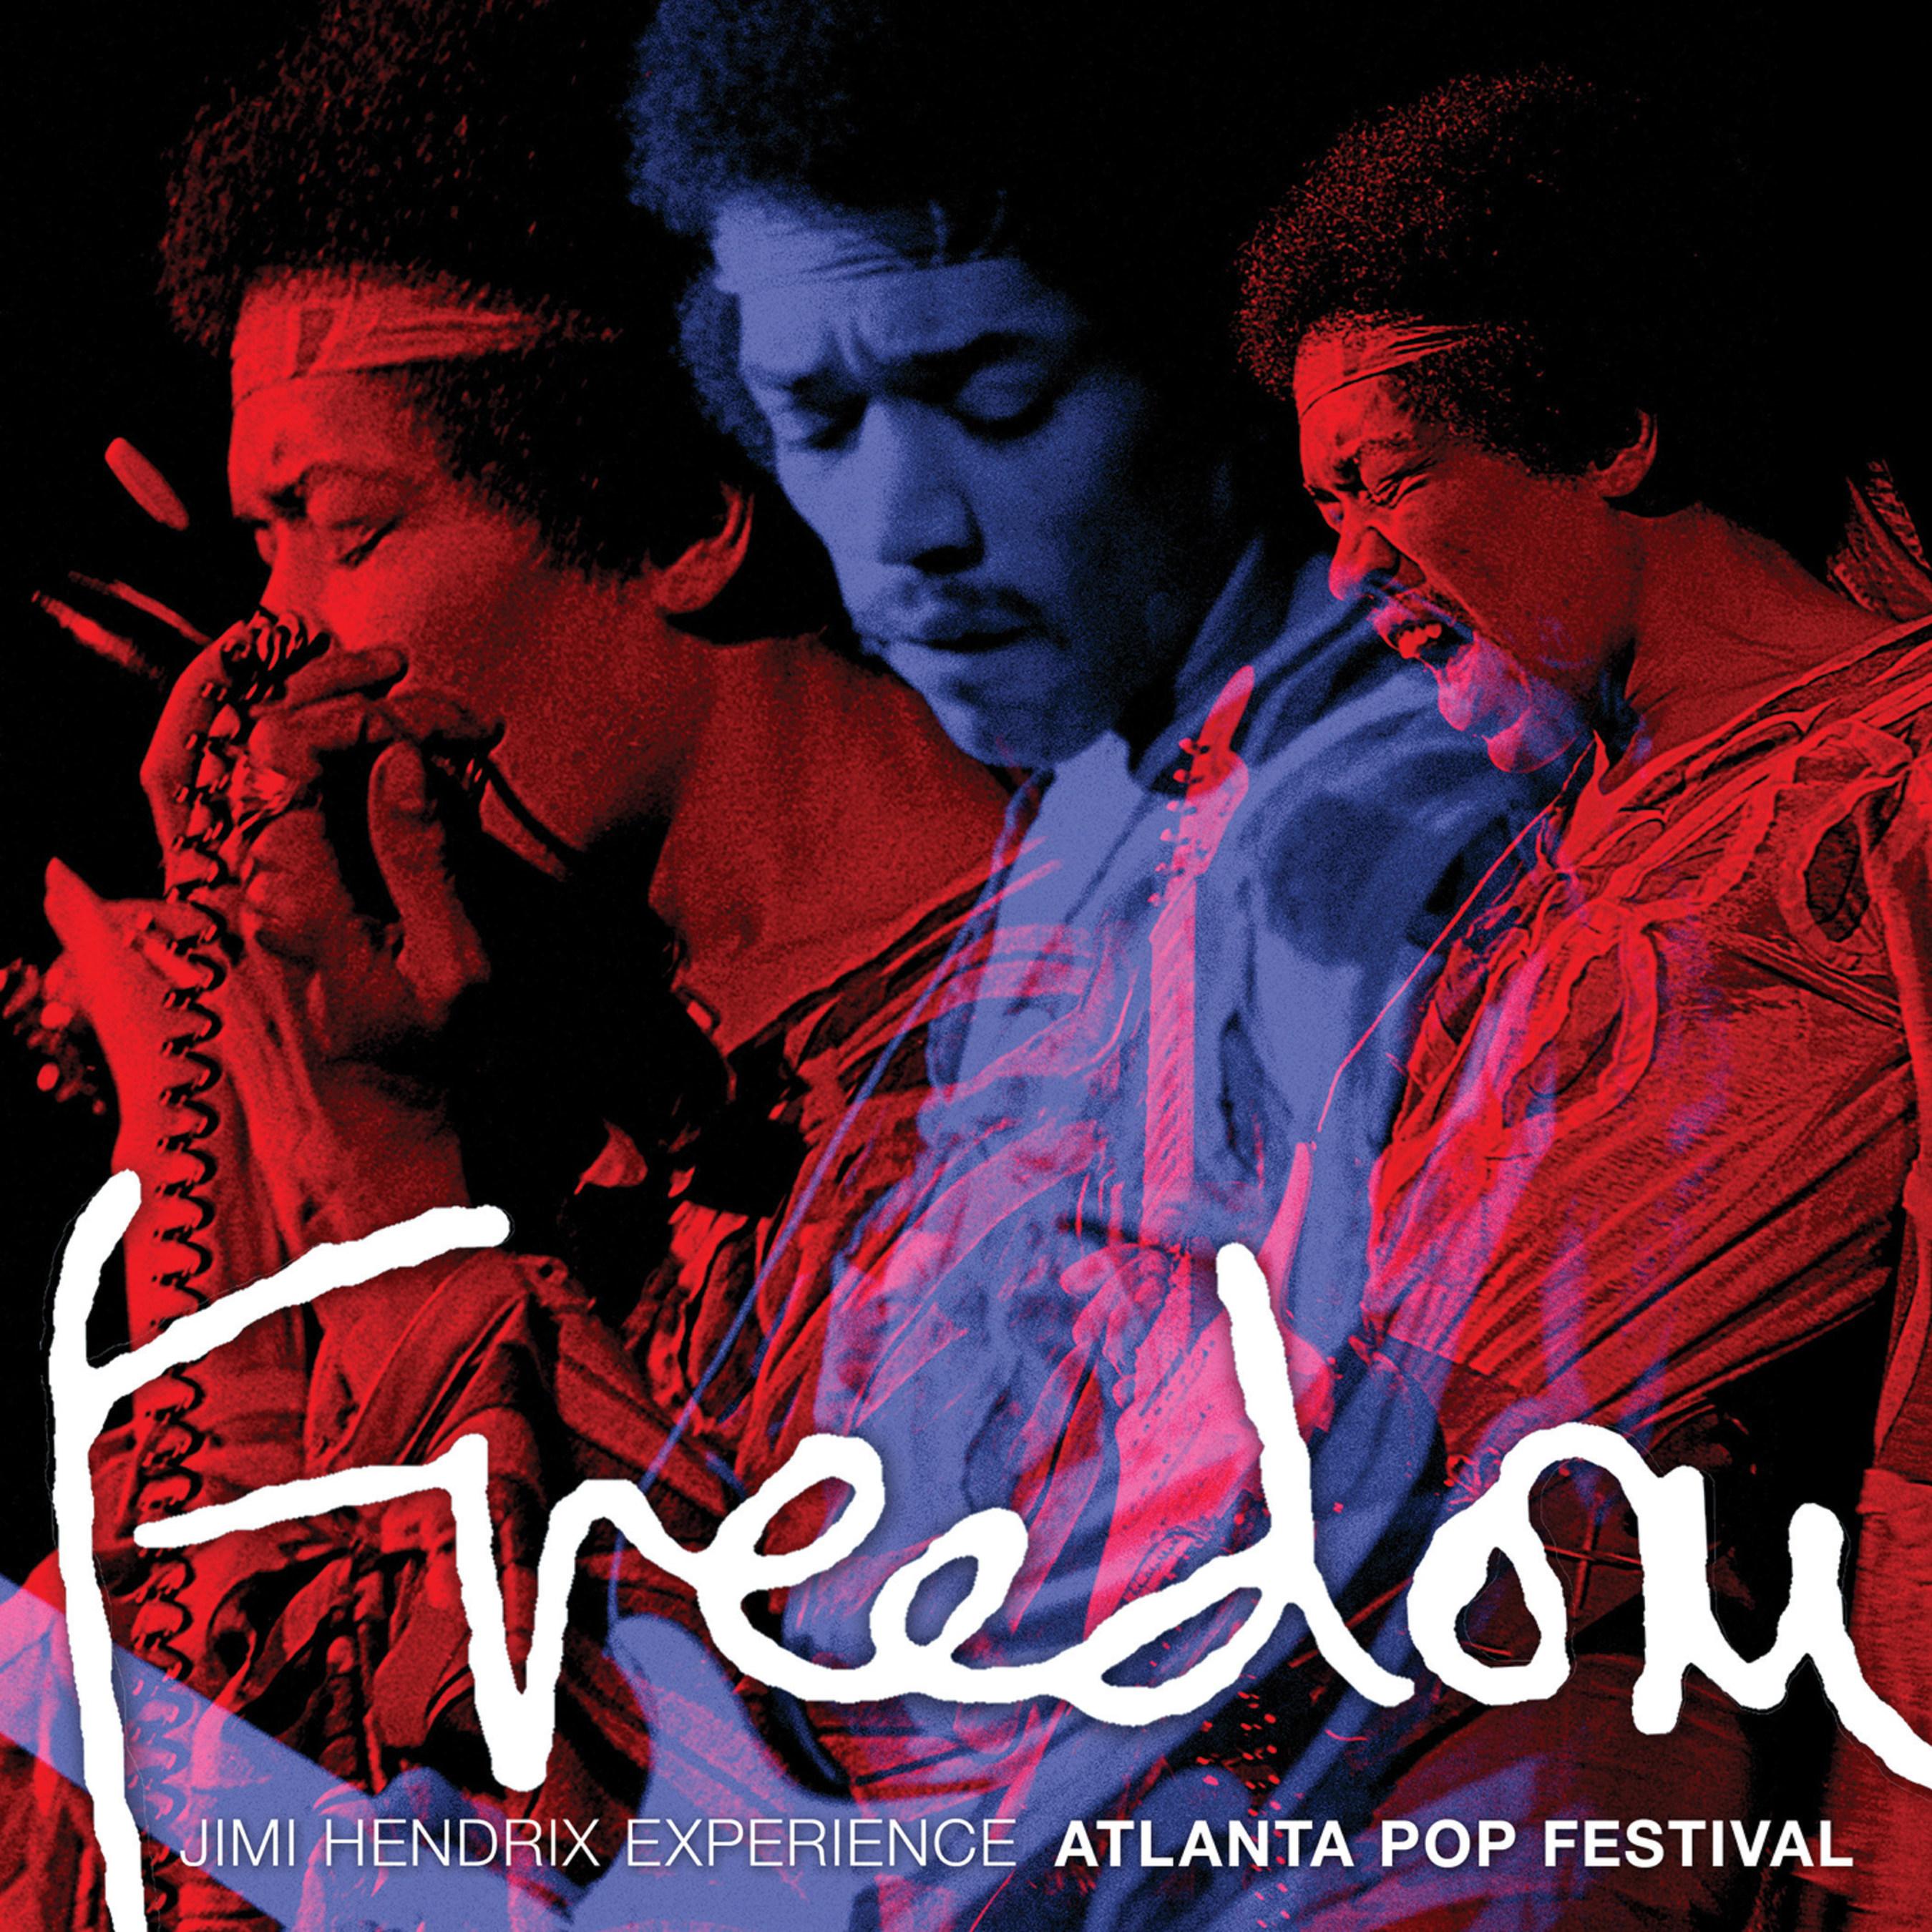 Jimi Hendrix Experience Freedom: Atlanta Pop Festival 2CD/2LP Out August 28